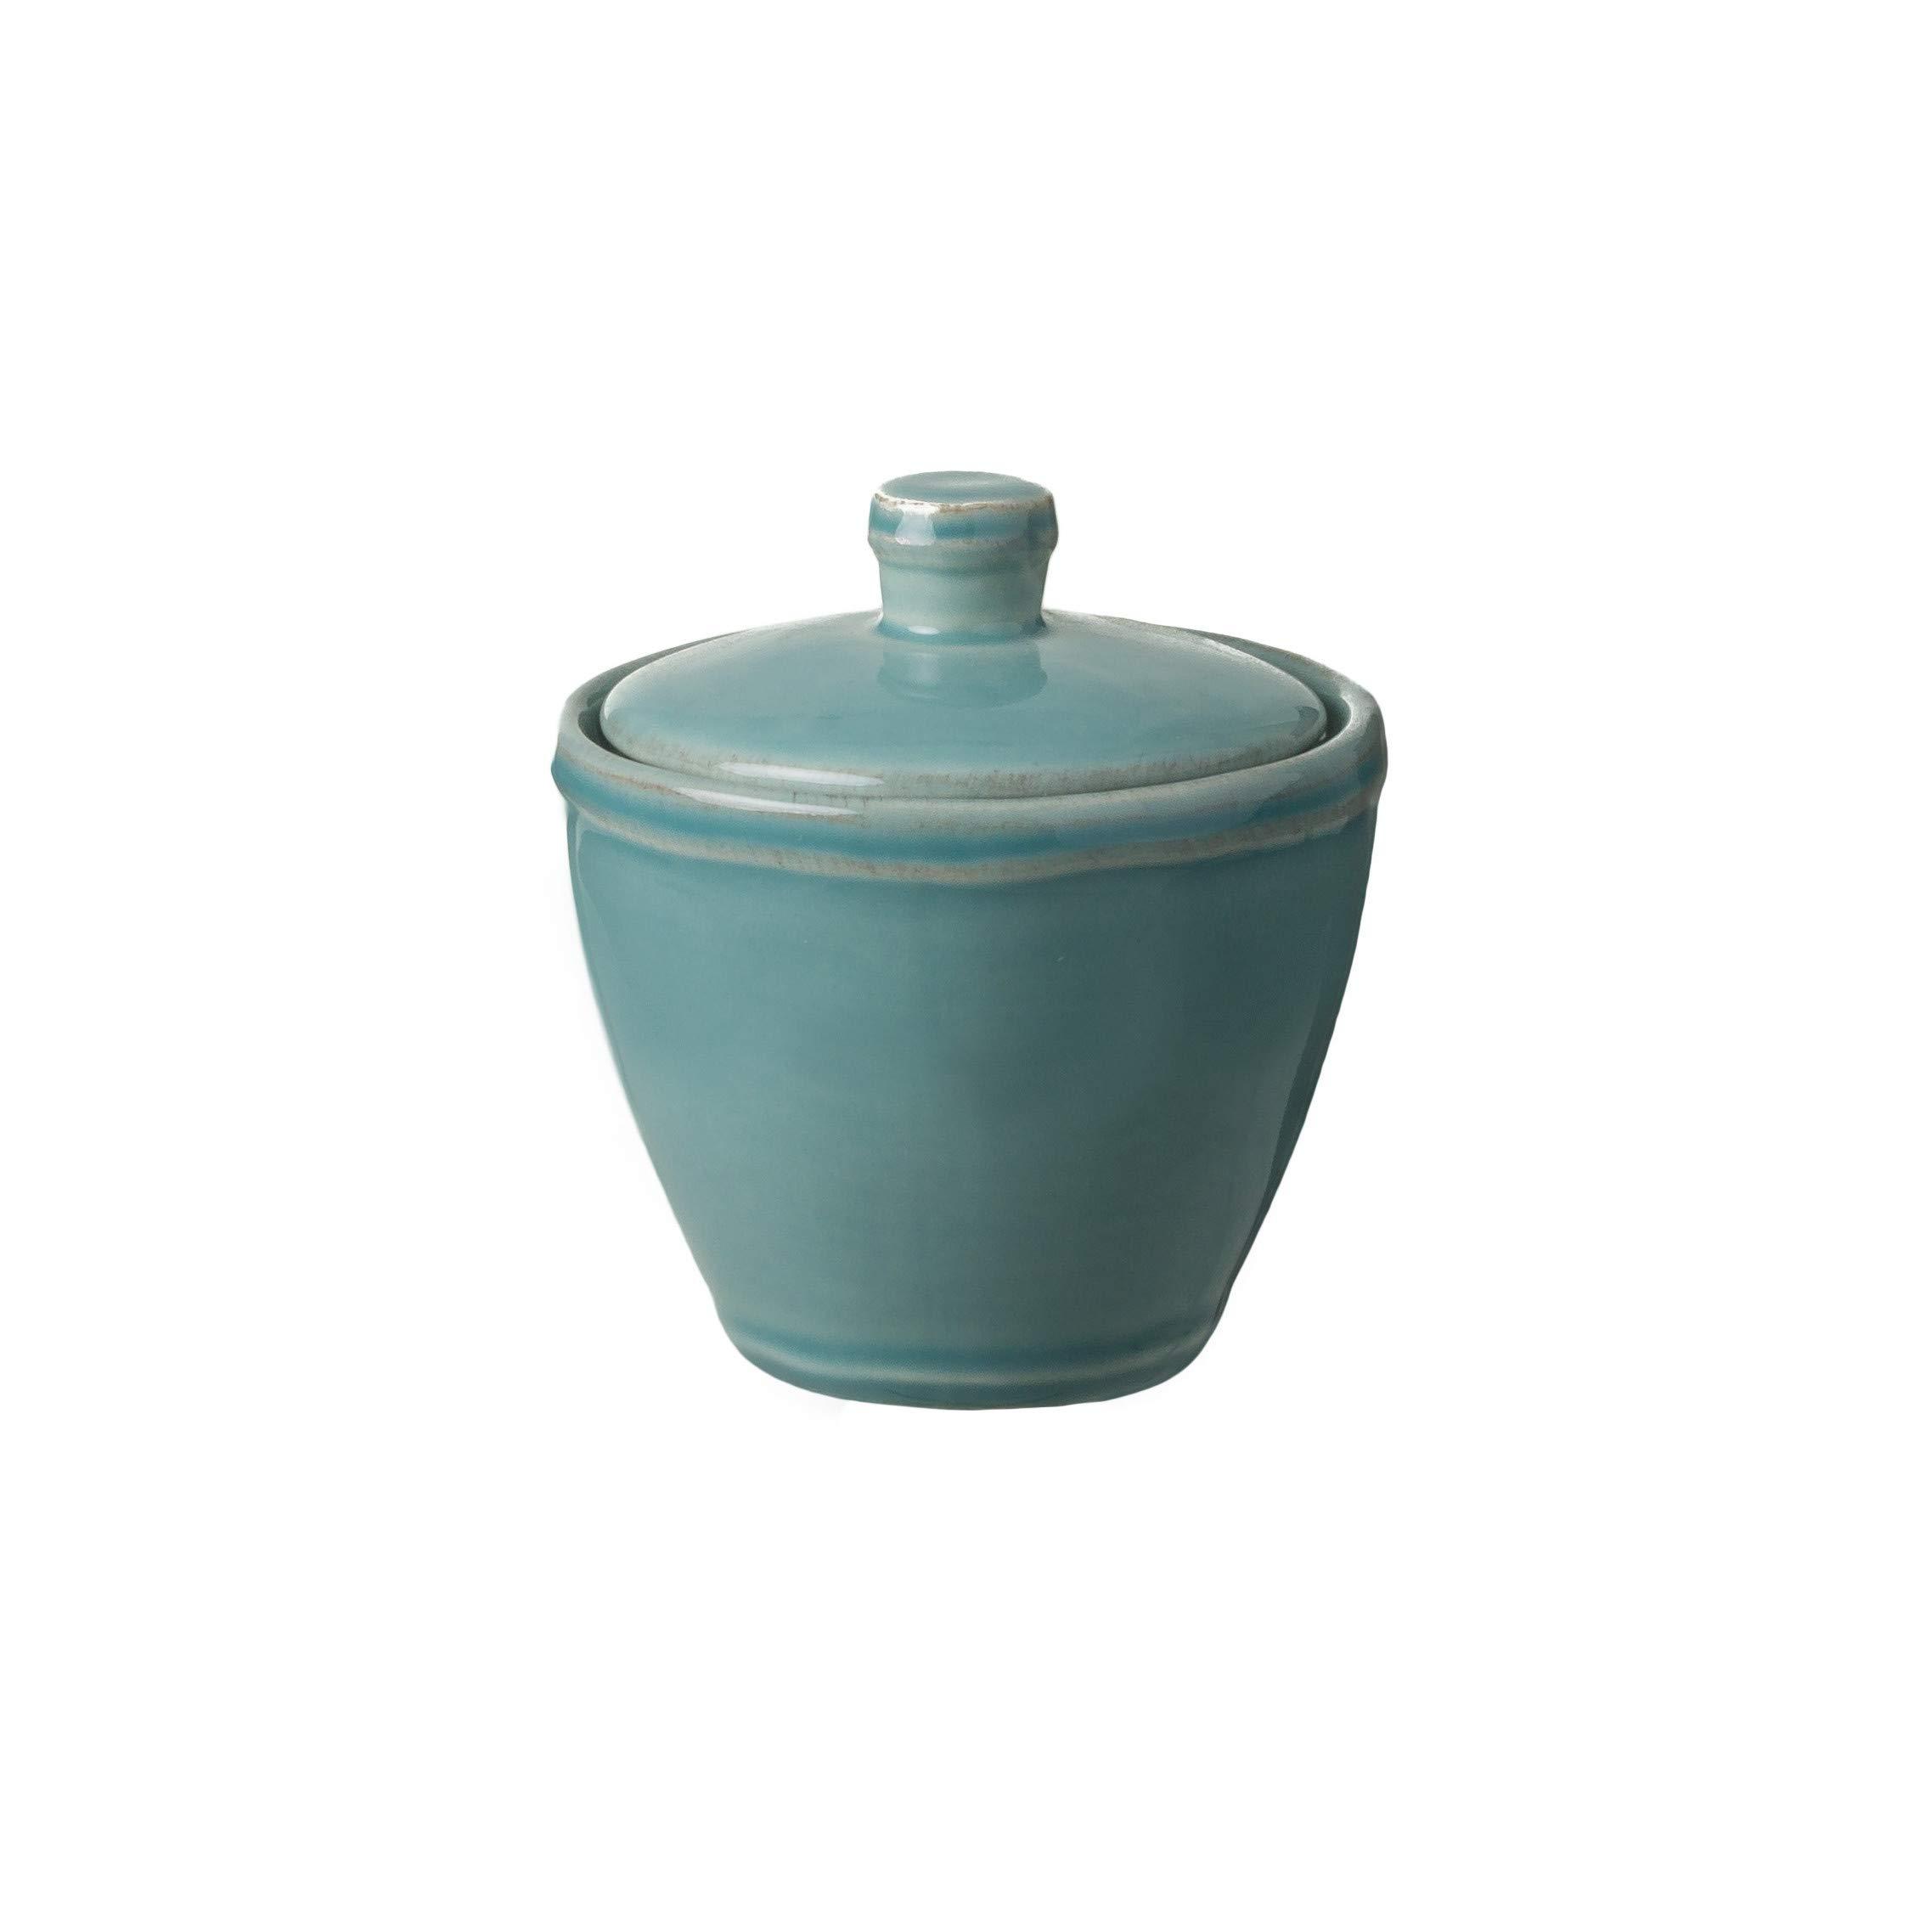 Casafina Stoneware Ceramic Dish Fontana Collection Sugar Bowl, Salt Cellar, Condiment Pot with Lid, 8 oz (Turquoise)